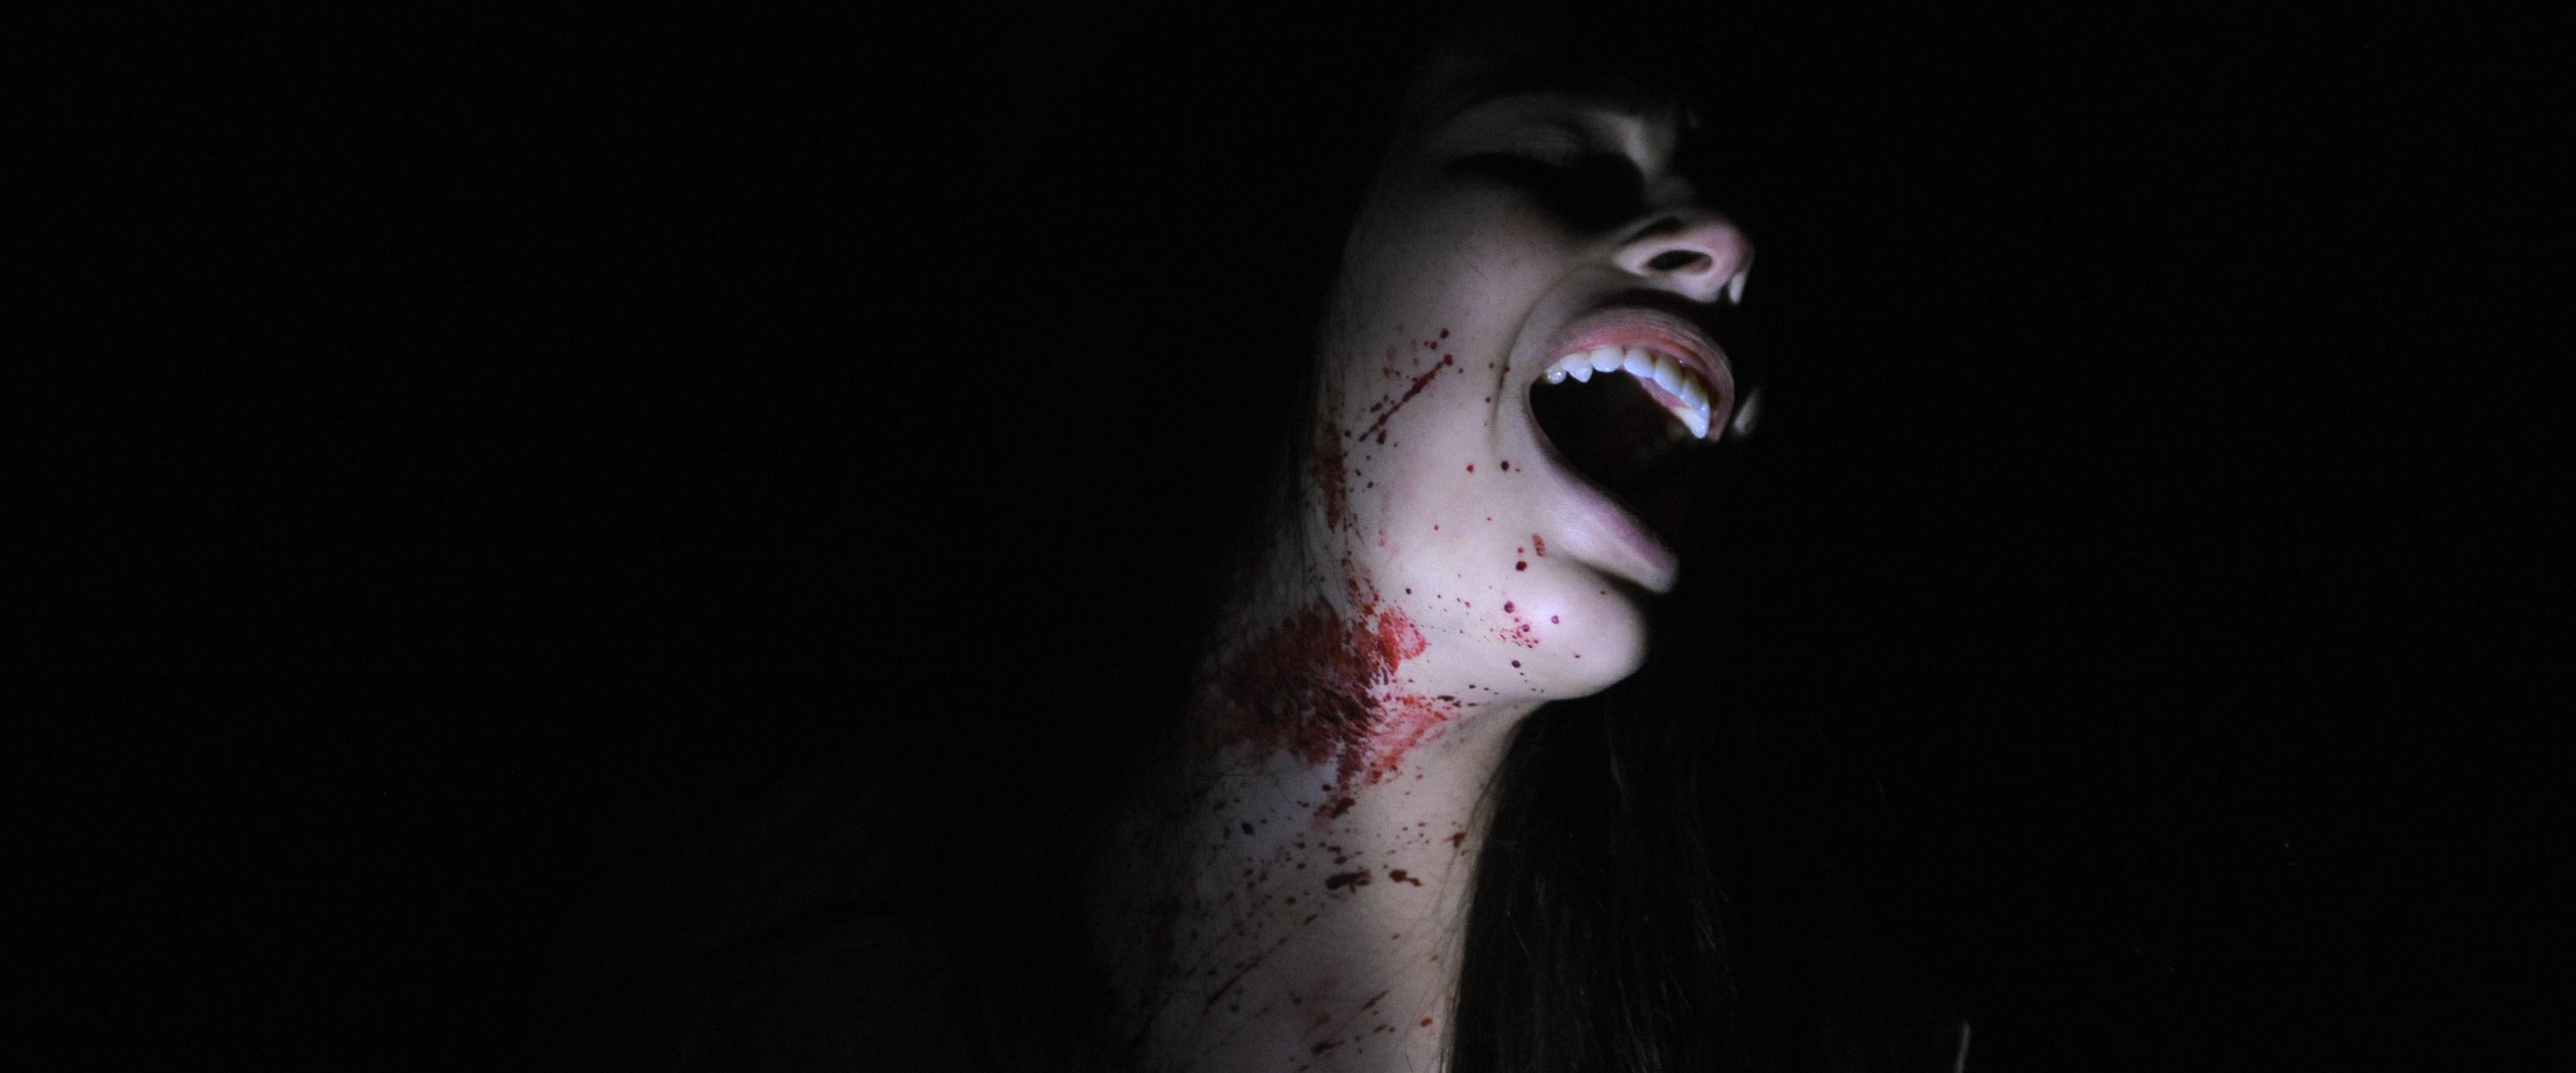 Nightlight (image source: Lionsgate)